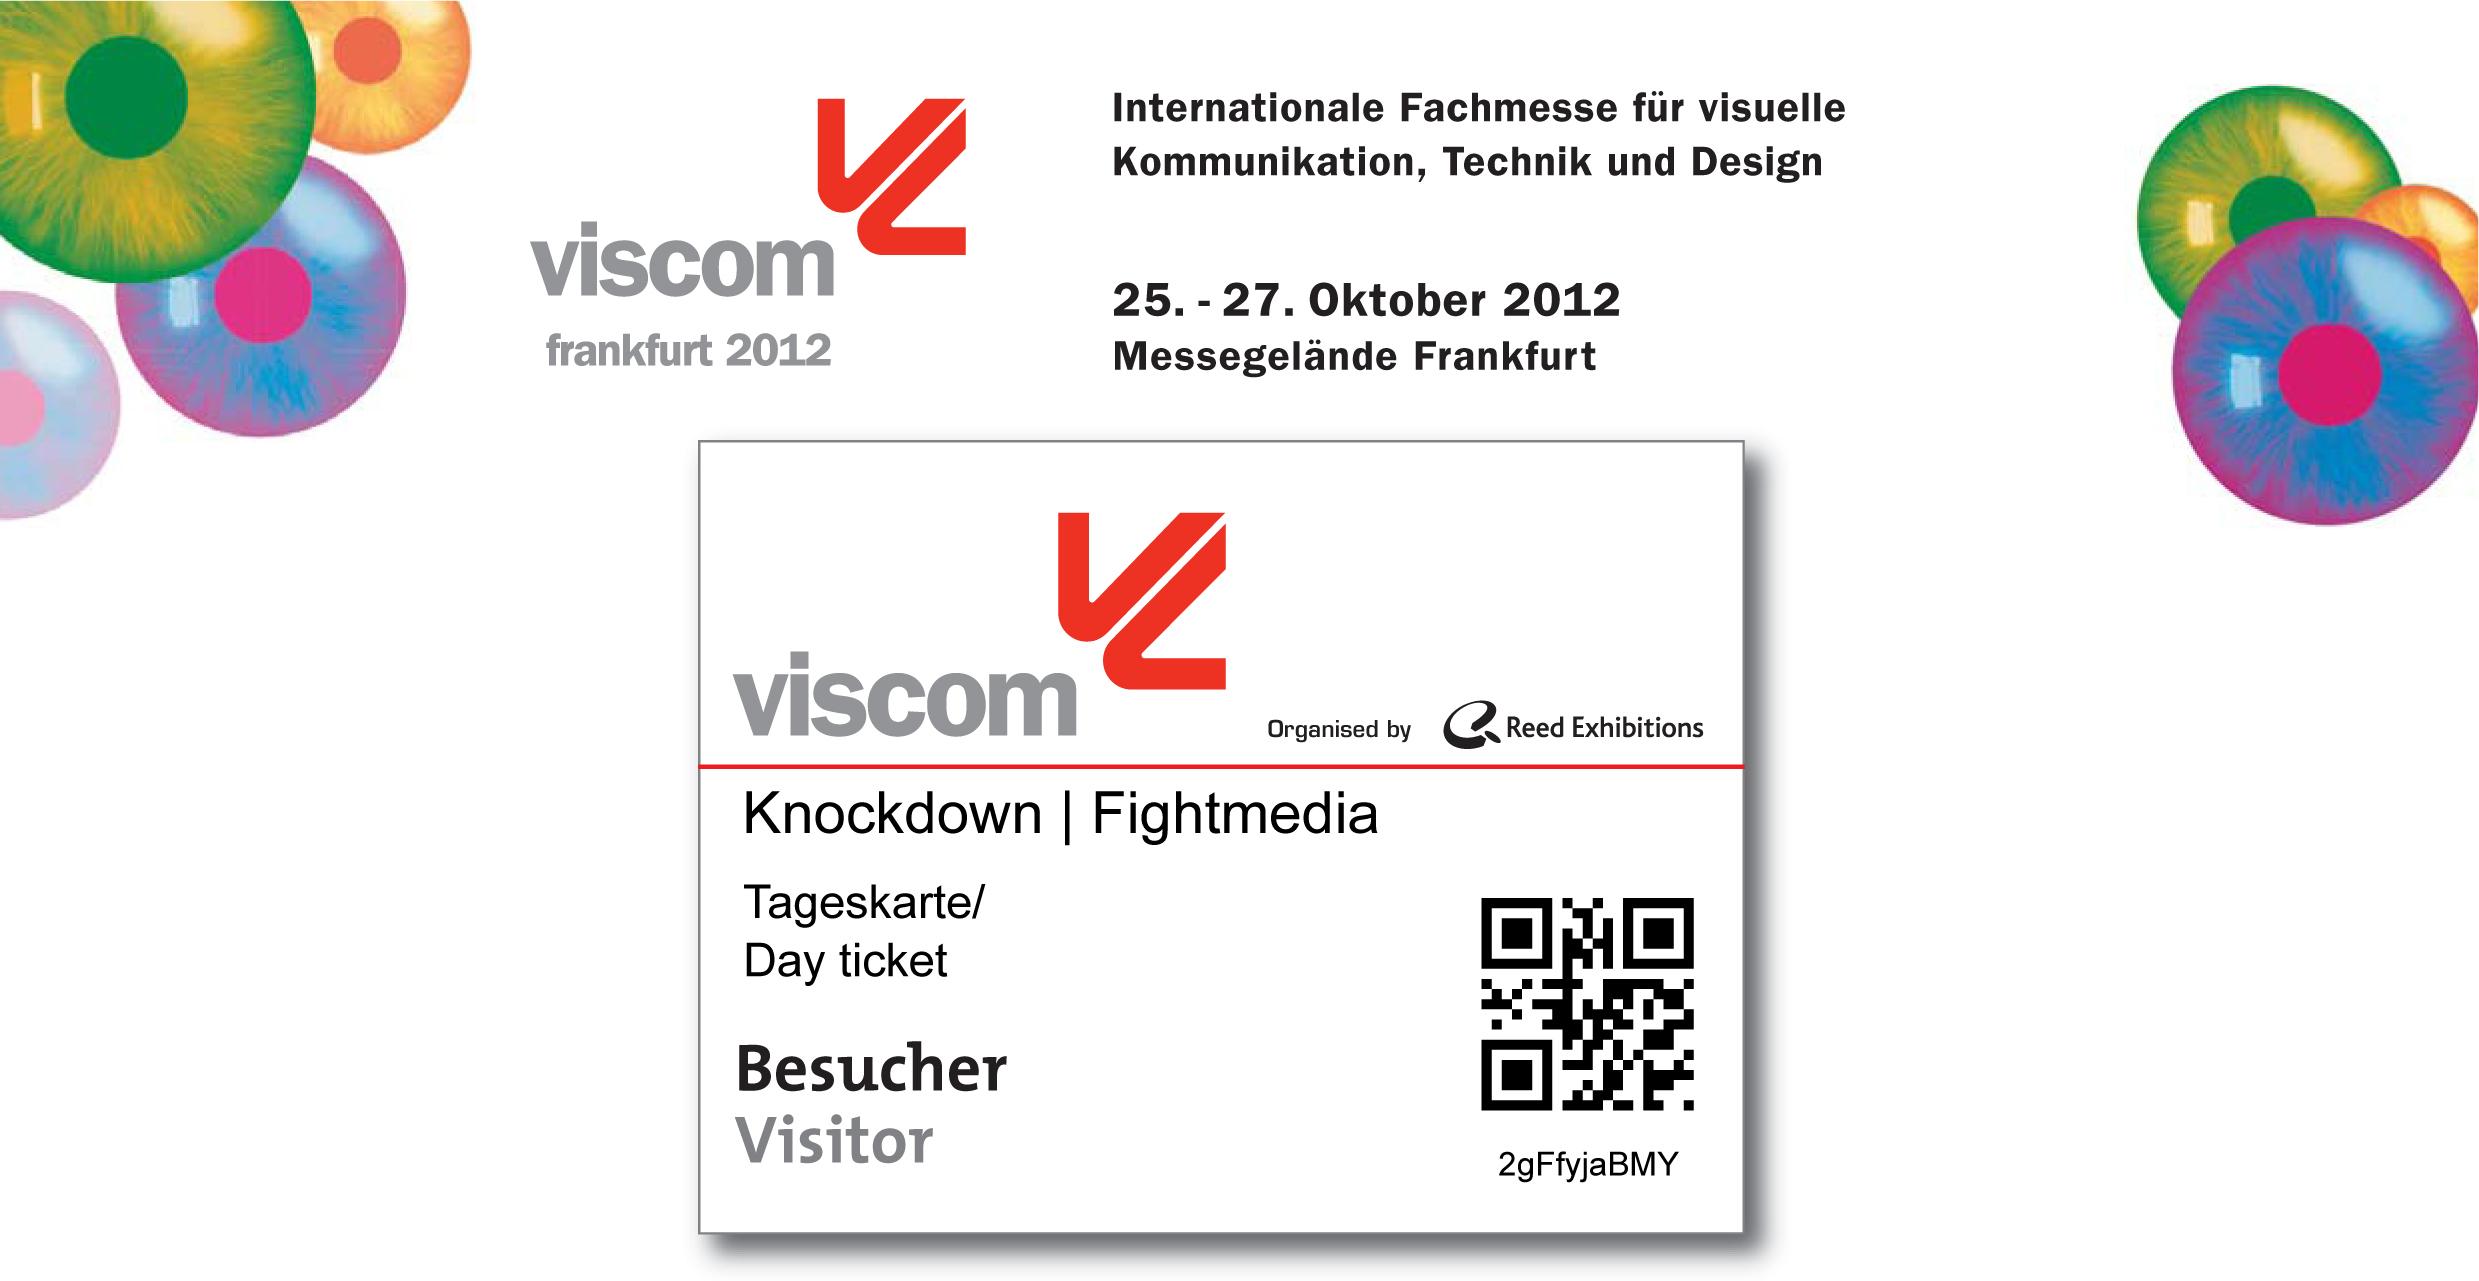 Fightmedia auf der Viscom 2012 in Frankfurt